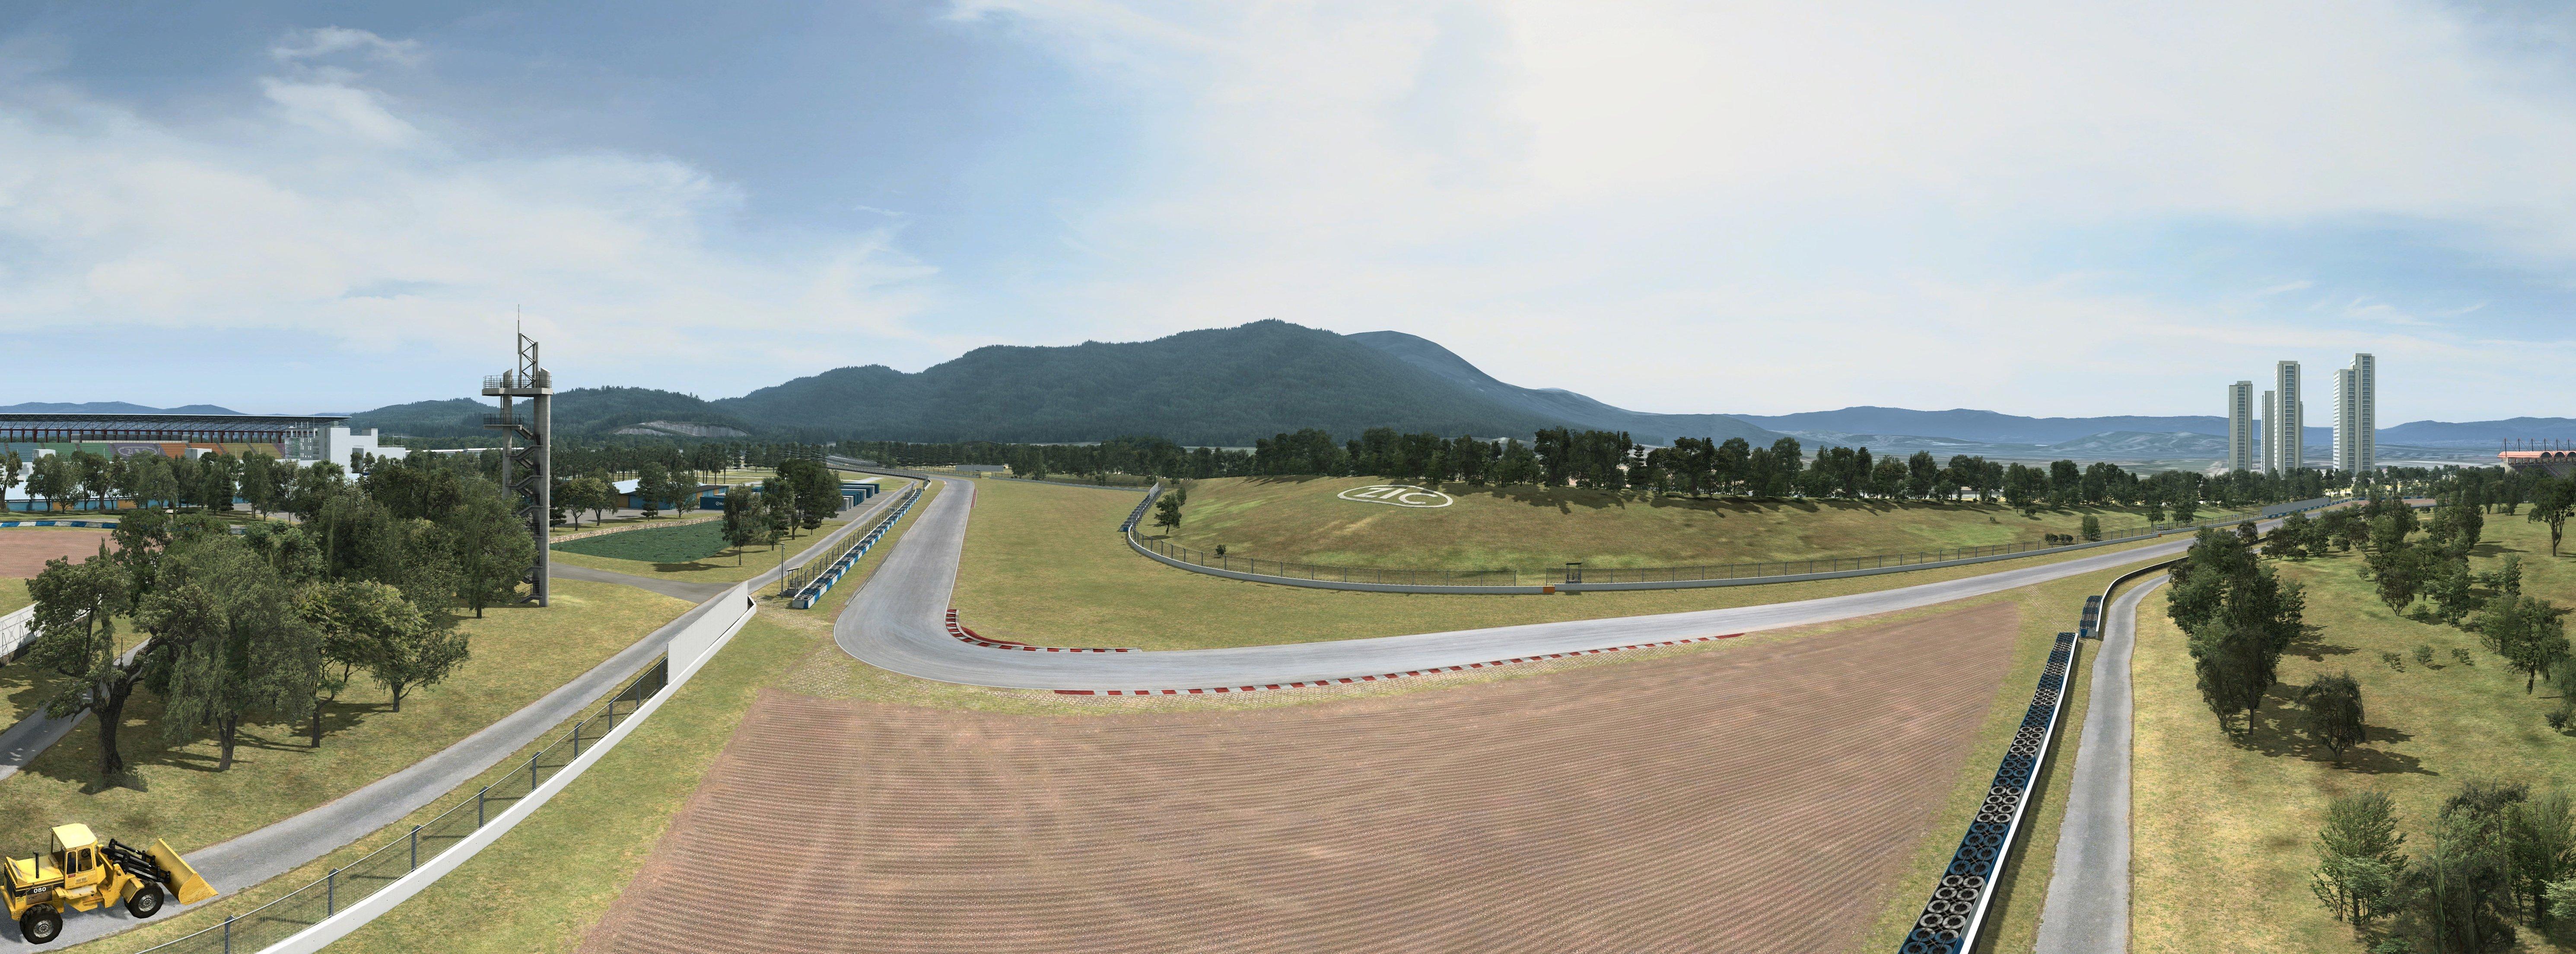 RaceRoom Zhuhai International Circuit 2